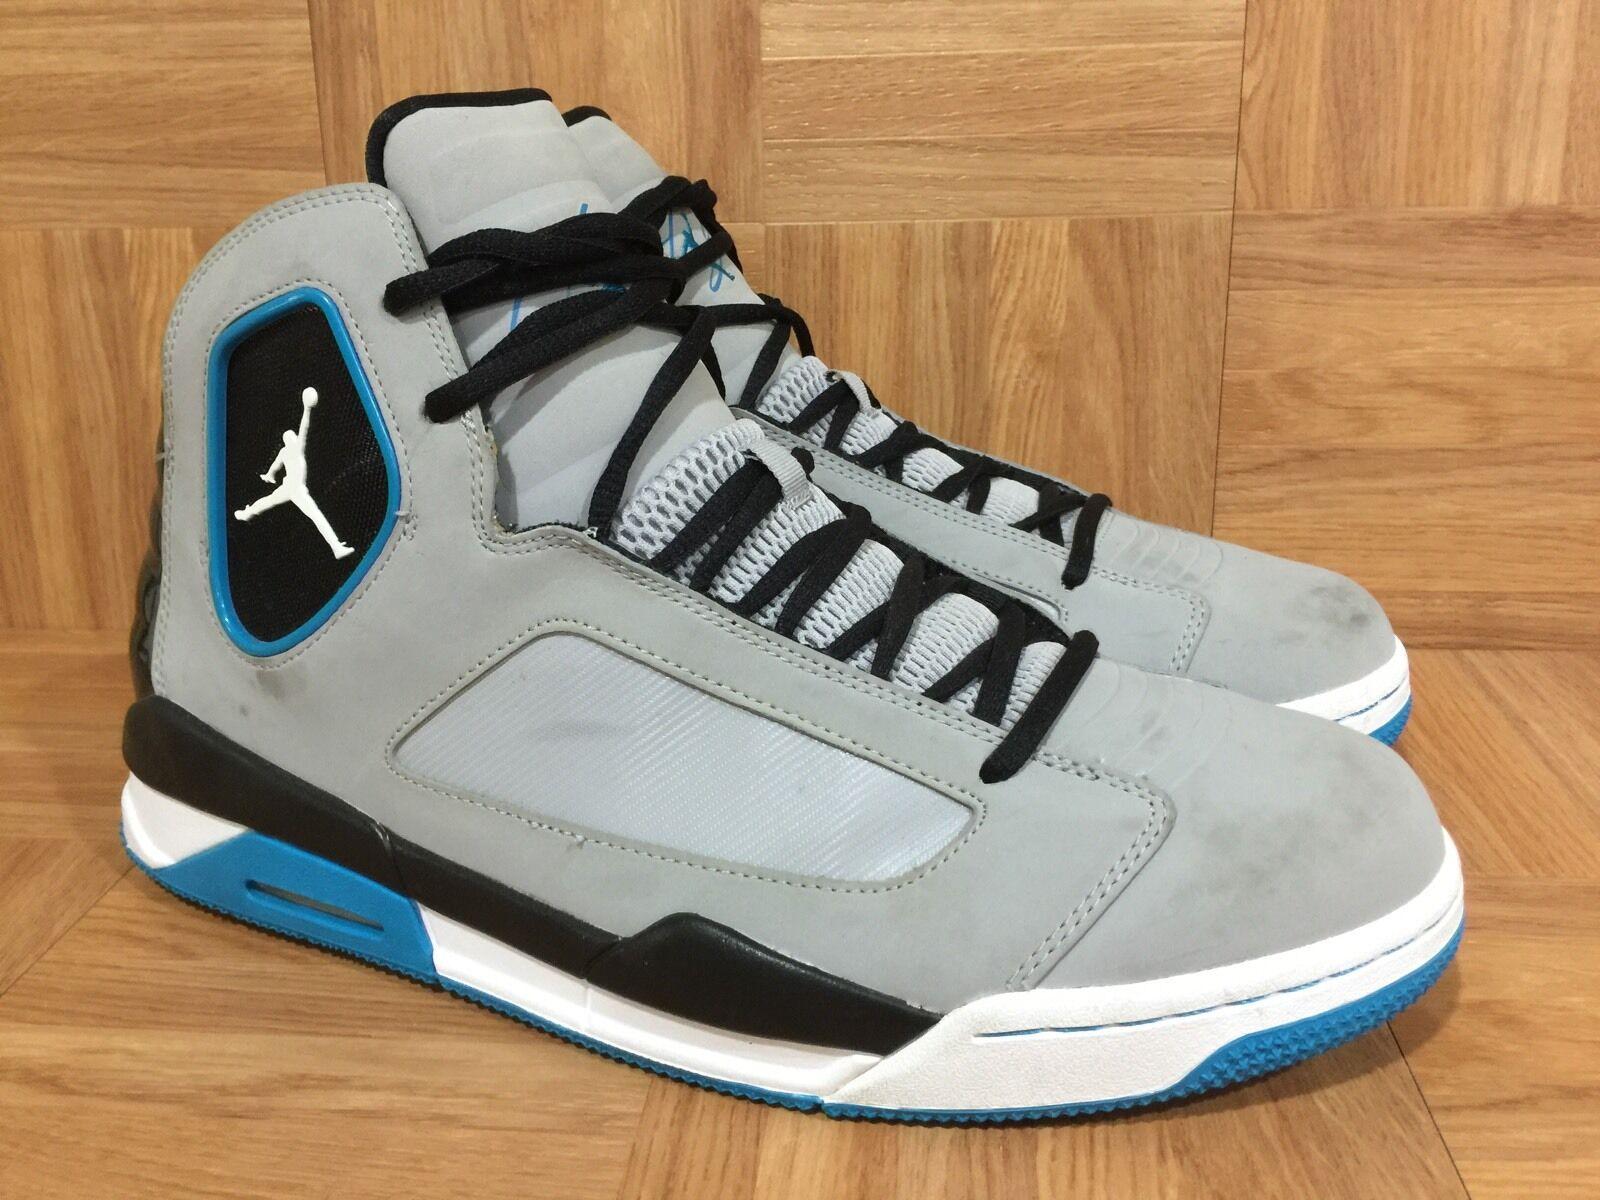 RARE  Nike Air Jordan Luminary Cool Gray Neo Turquoise White Sz 13 551820-009